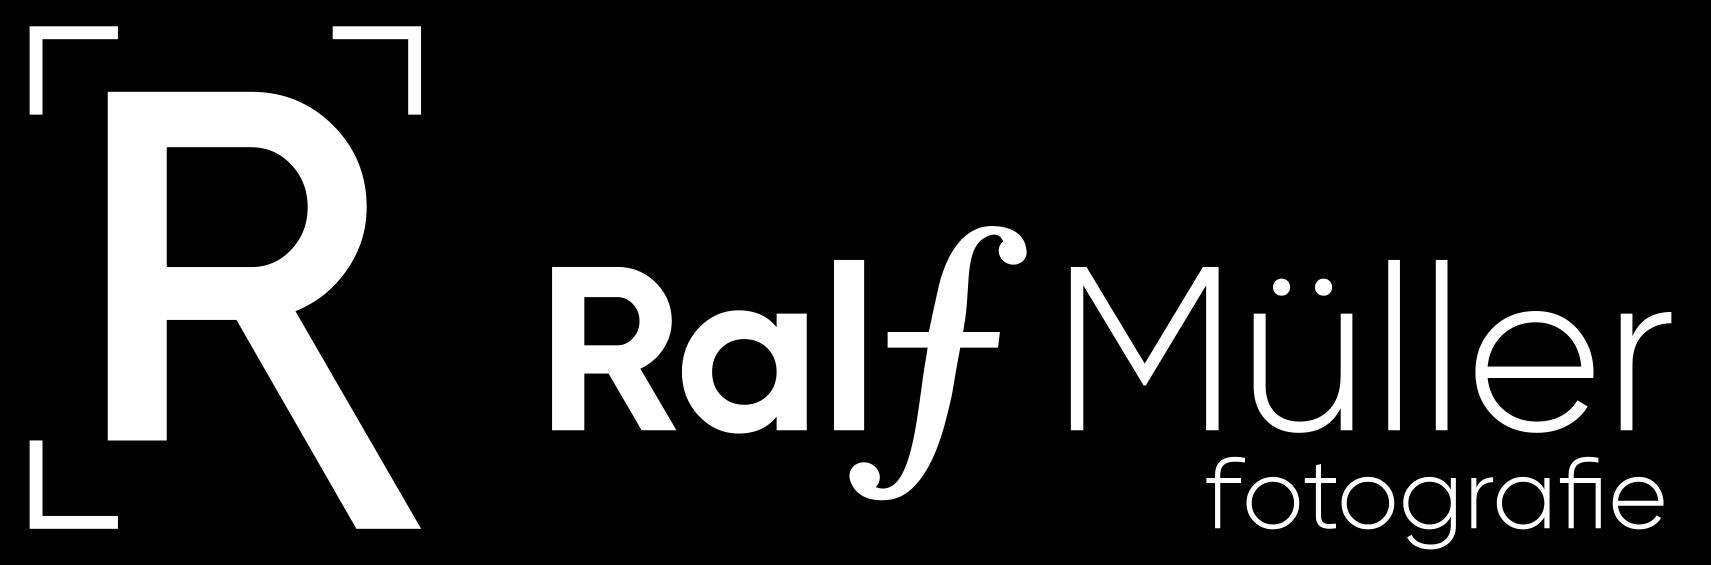 Ralf Mueller | fotografie